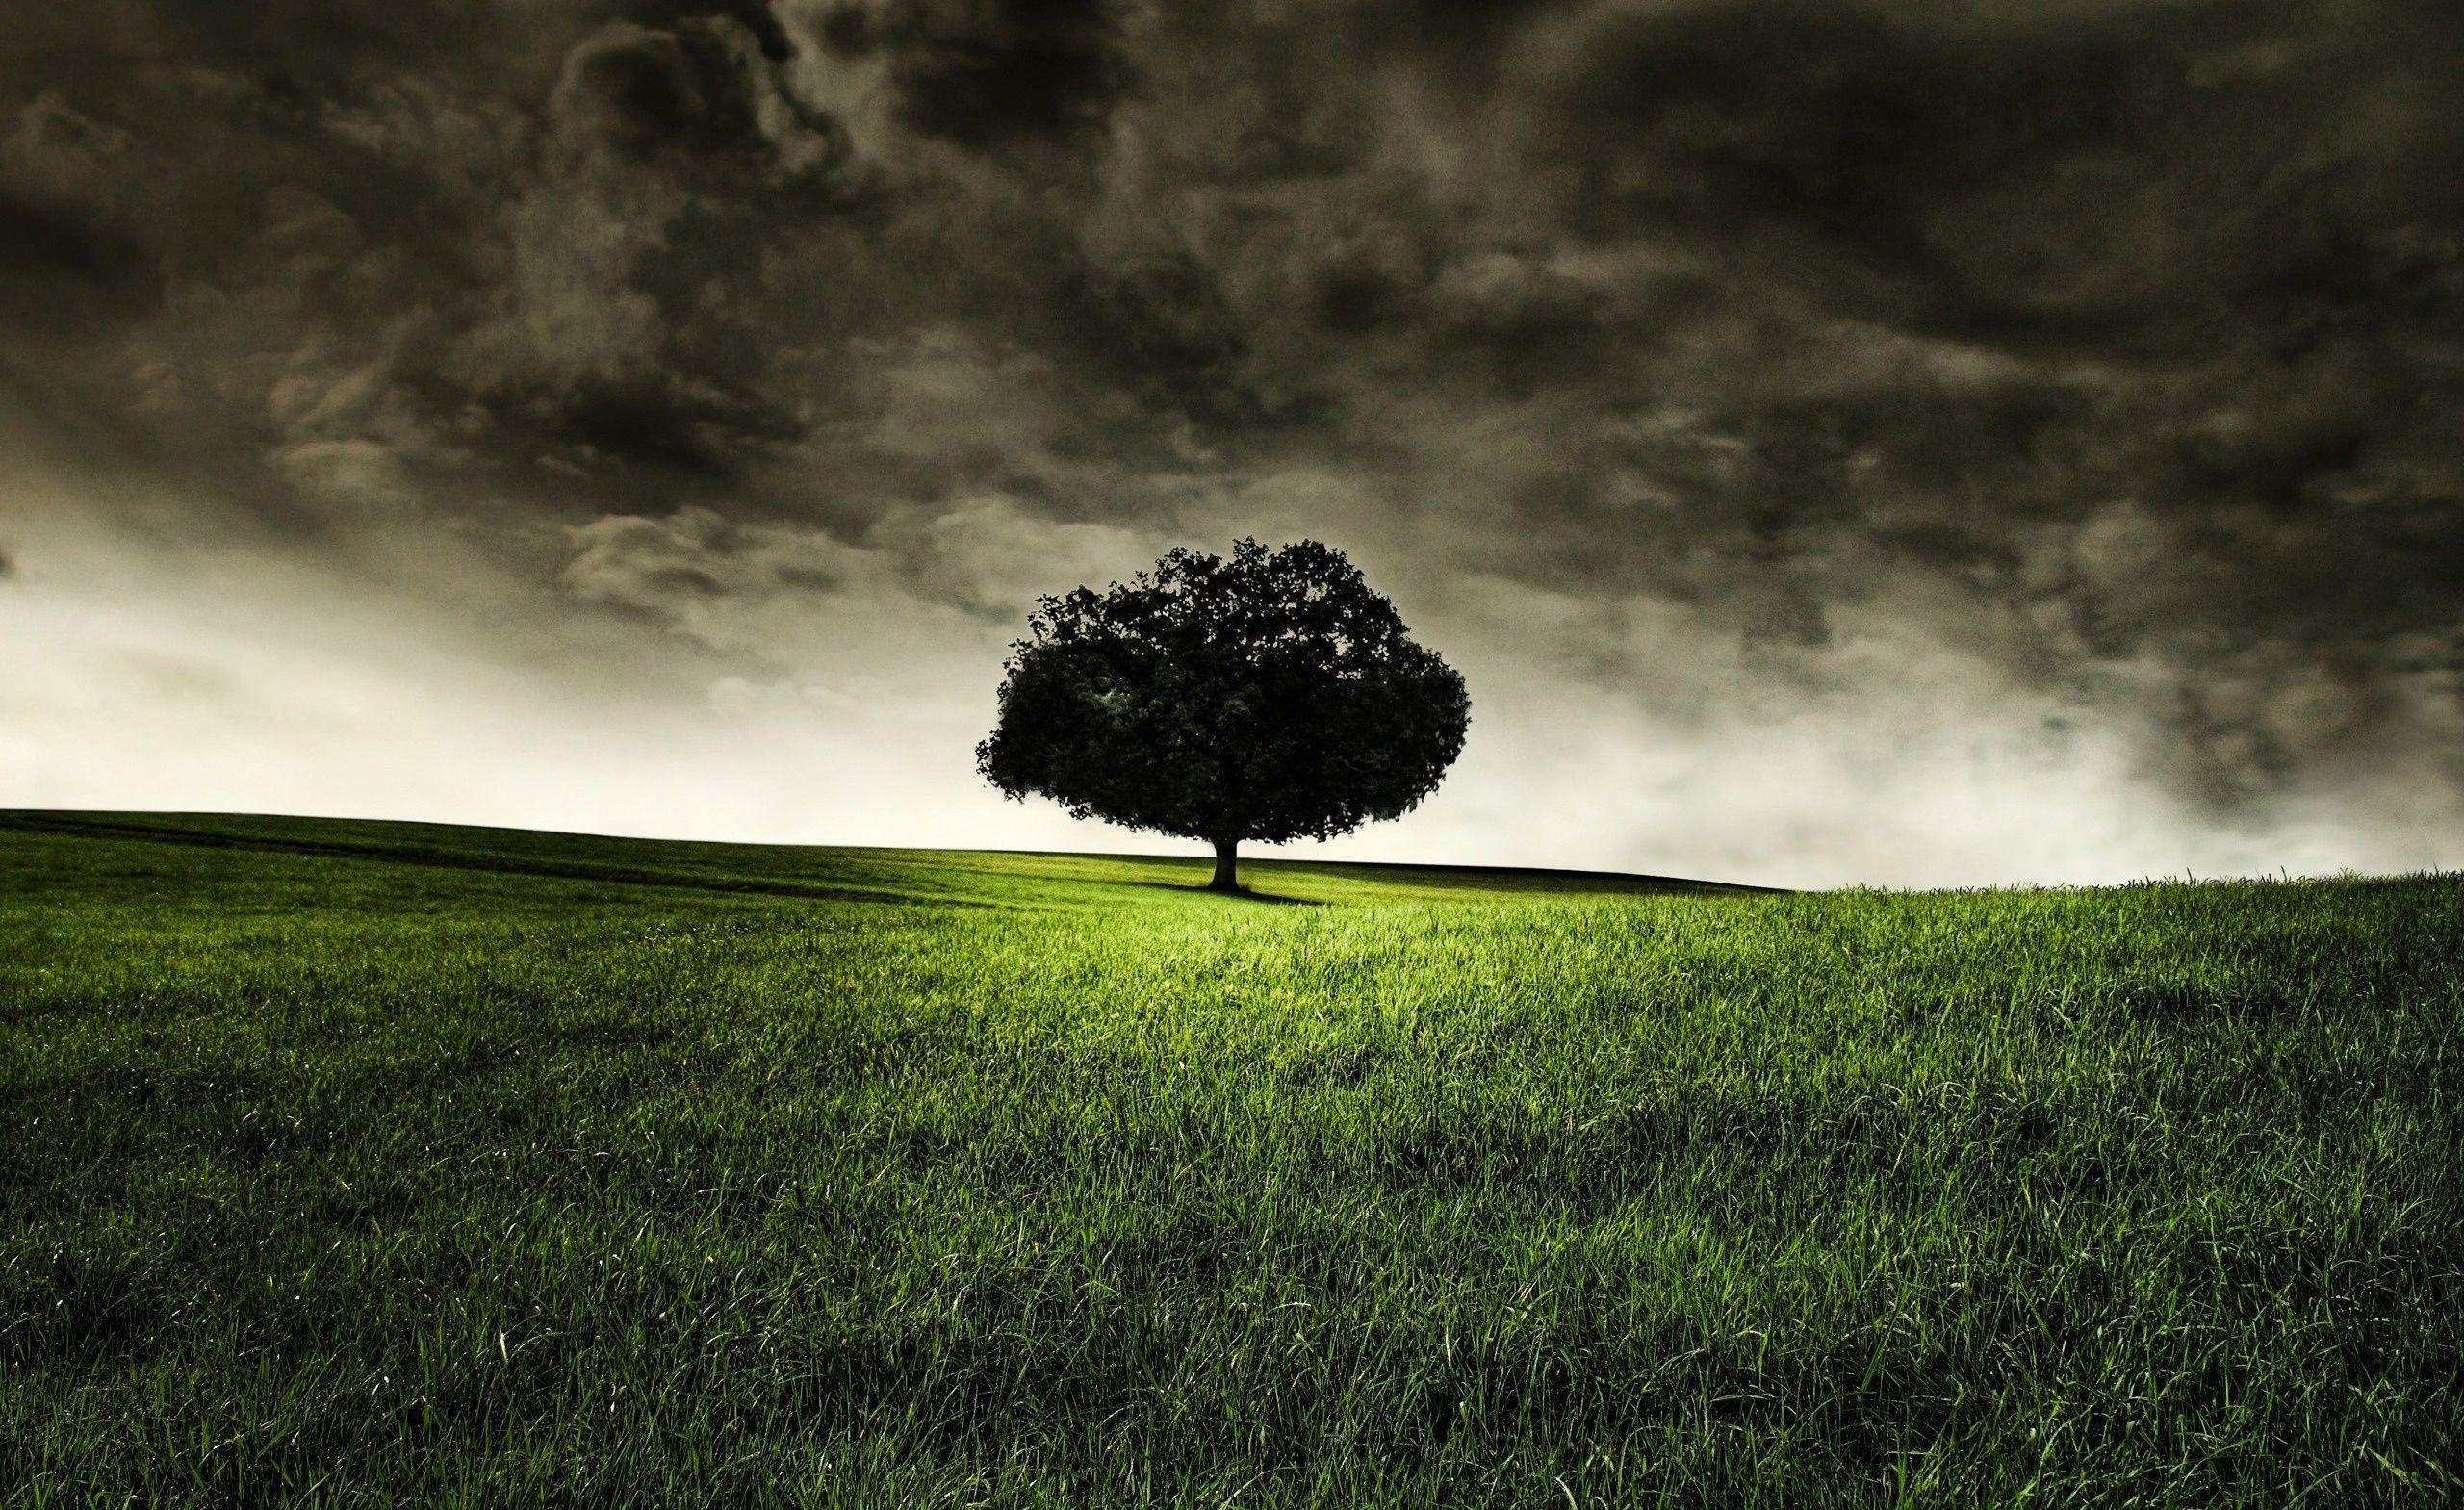 Dark Nature Wallpapers Top Free Dark Nature Backgrounds